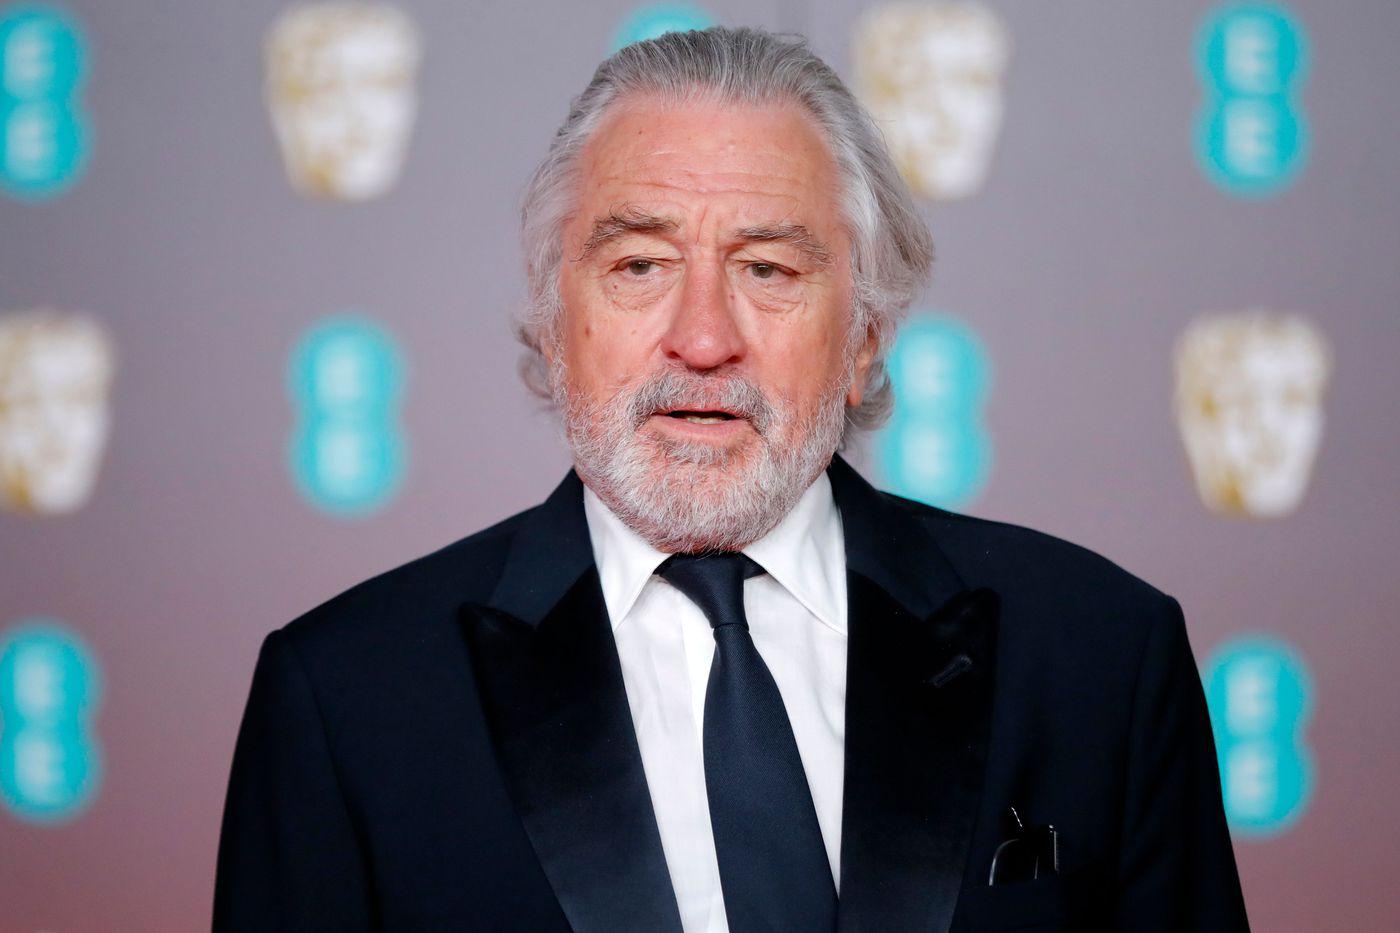 Actor Robert De Niro at the red carpet